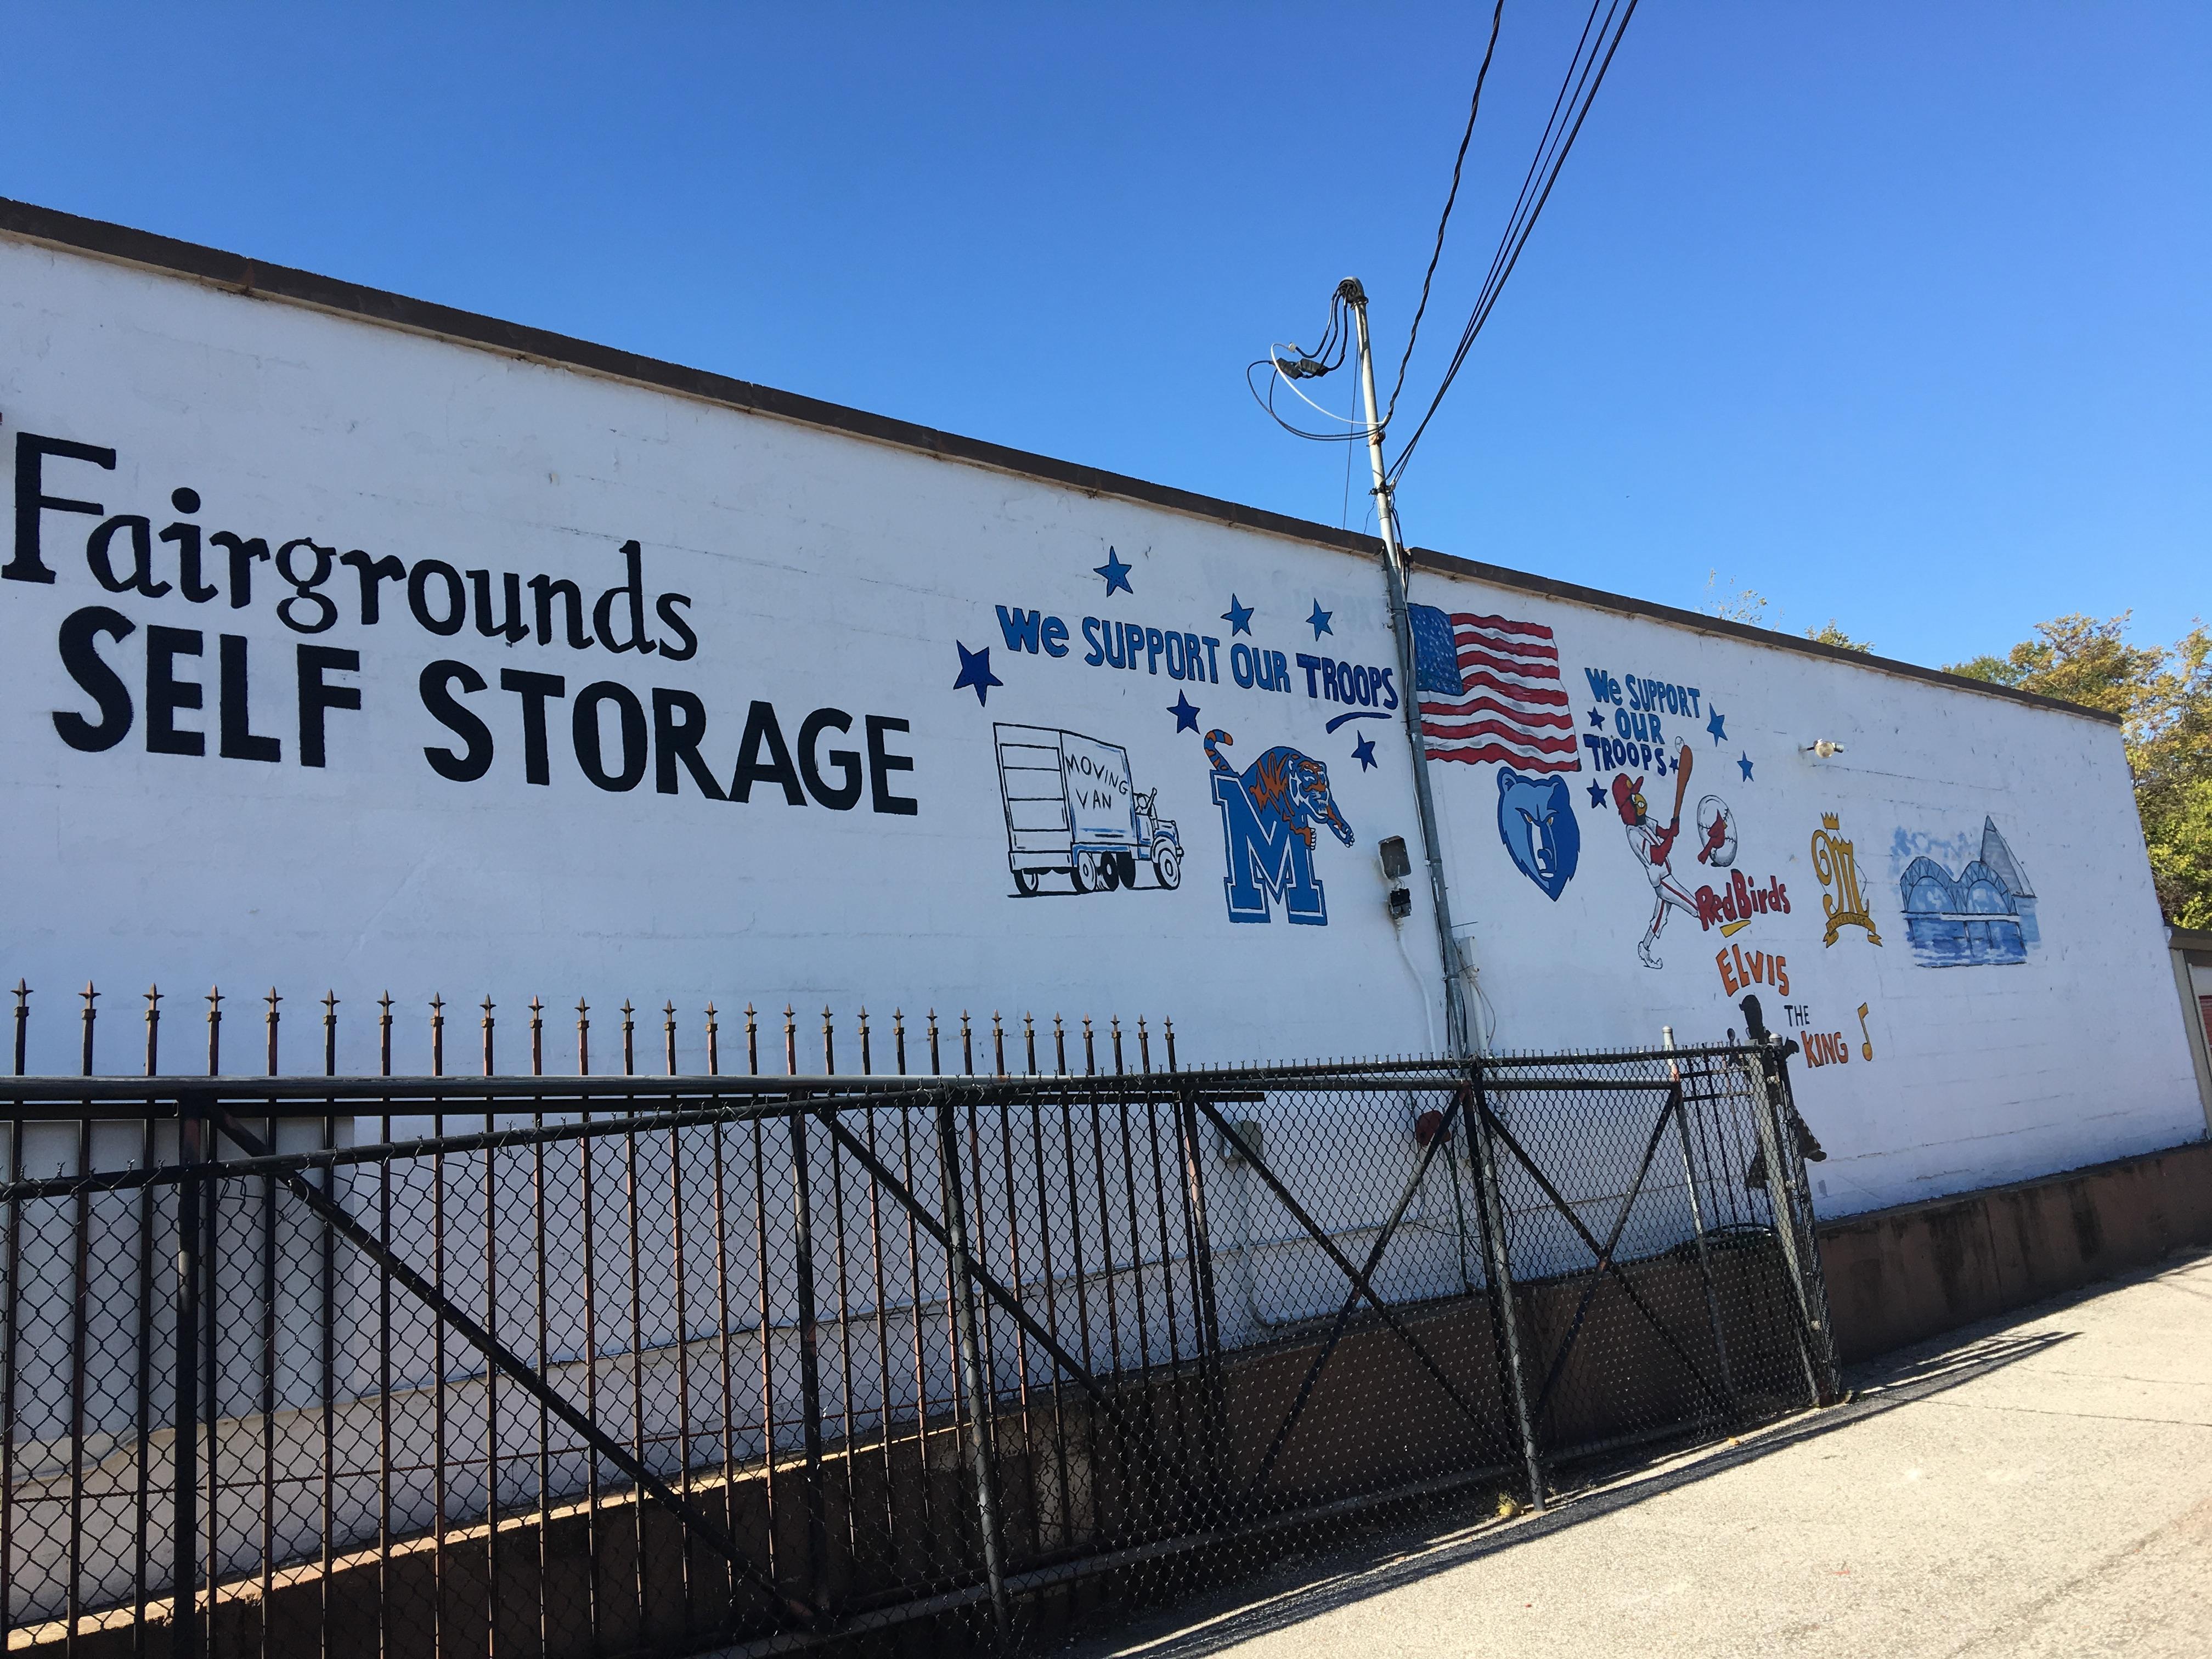 Self Storage Memphis Tn Fairgrounds Self Storage